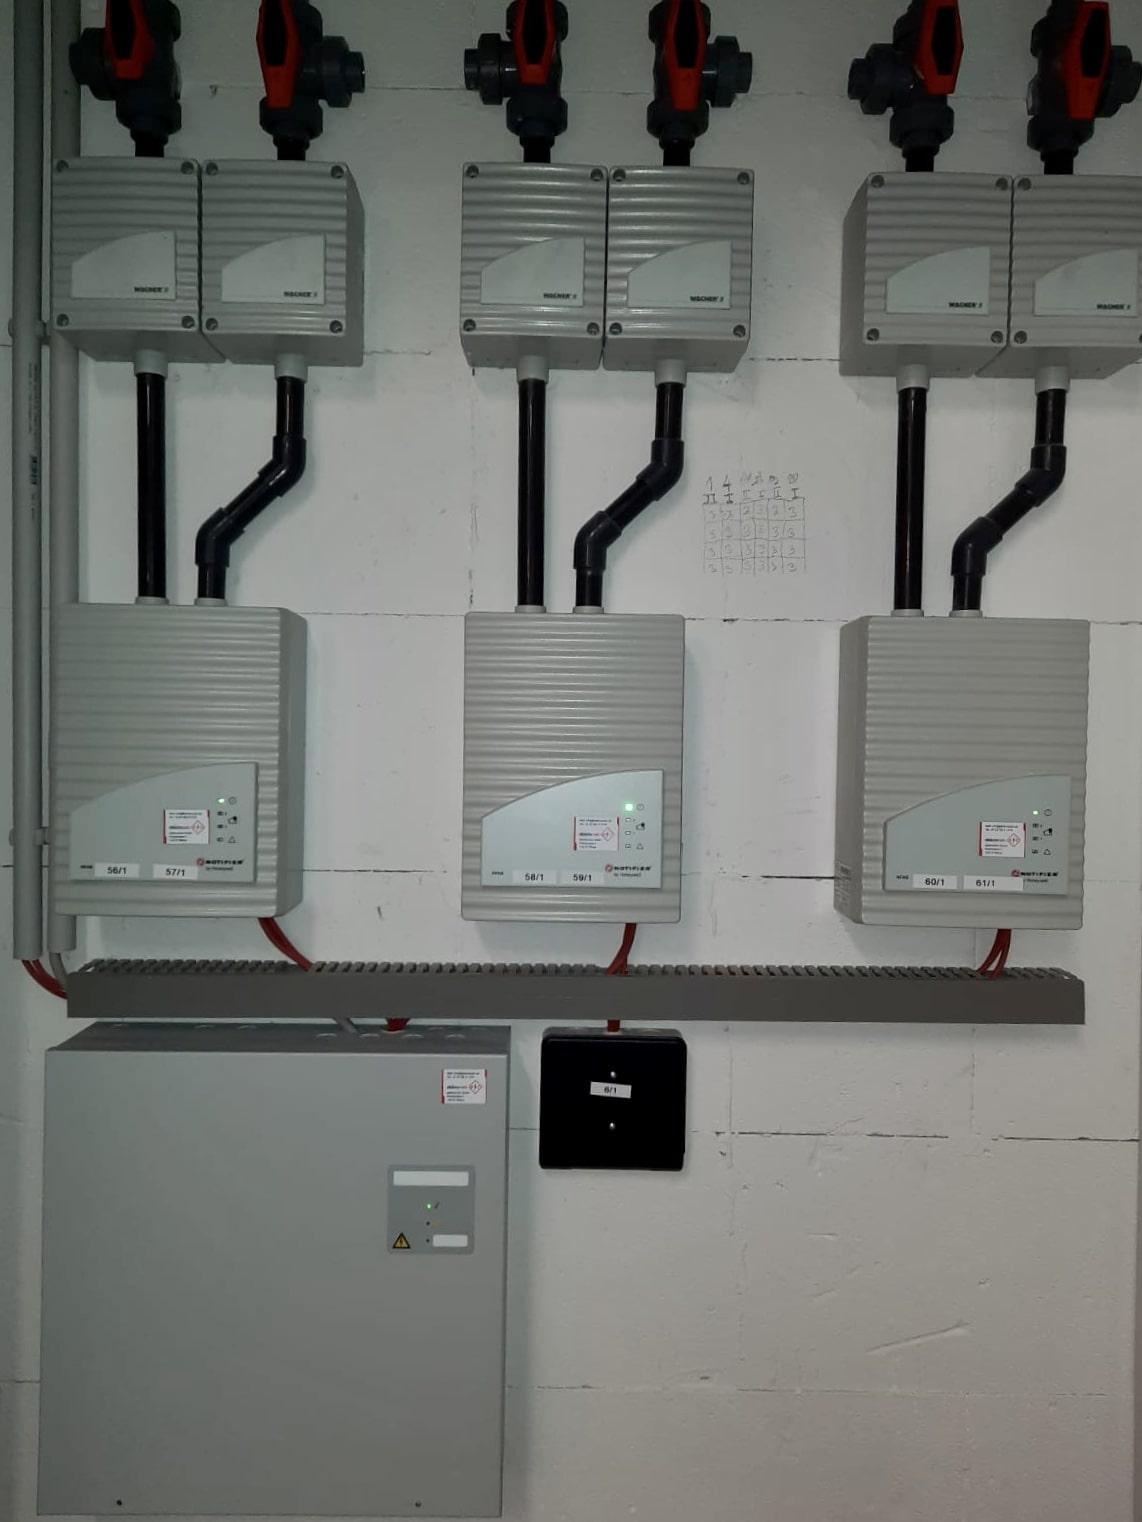 elektrocom Elektroanlagen Kommunikationsanlagen Referenzbild 09